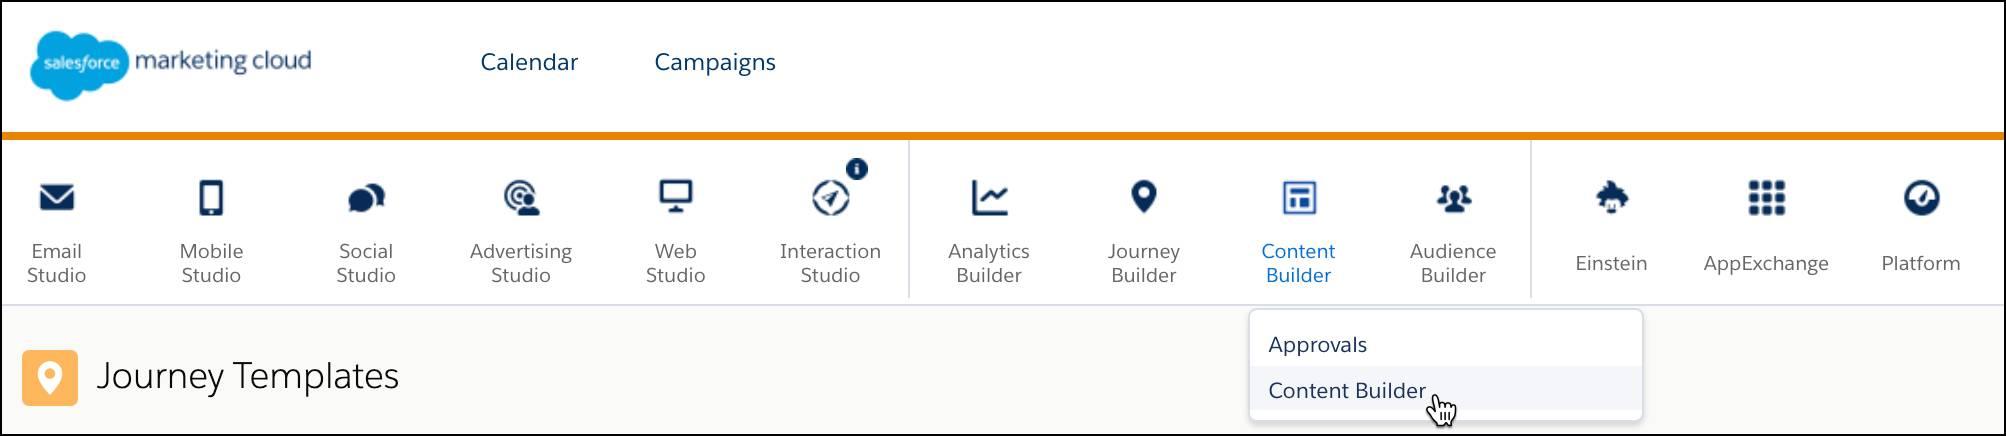 Menu de navigation MarketingCloud.